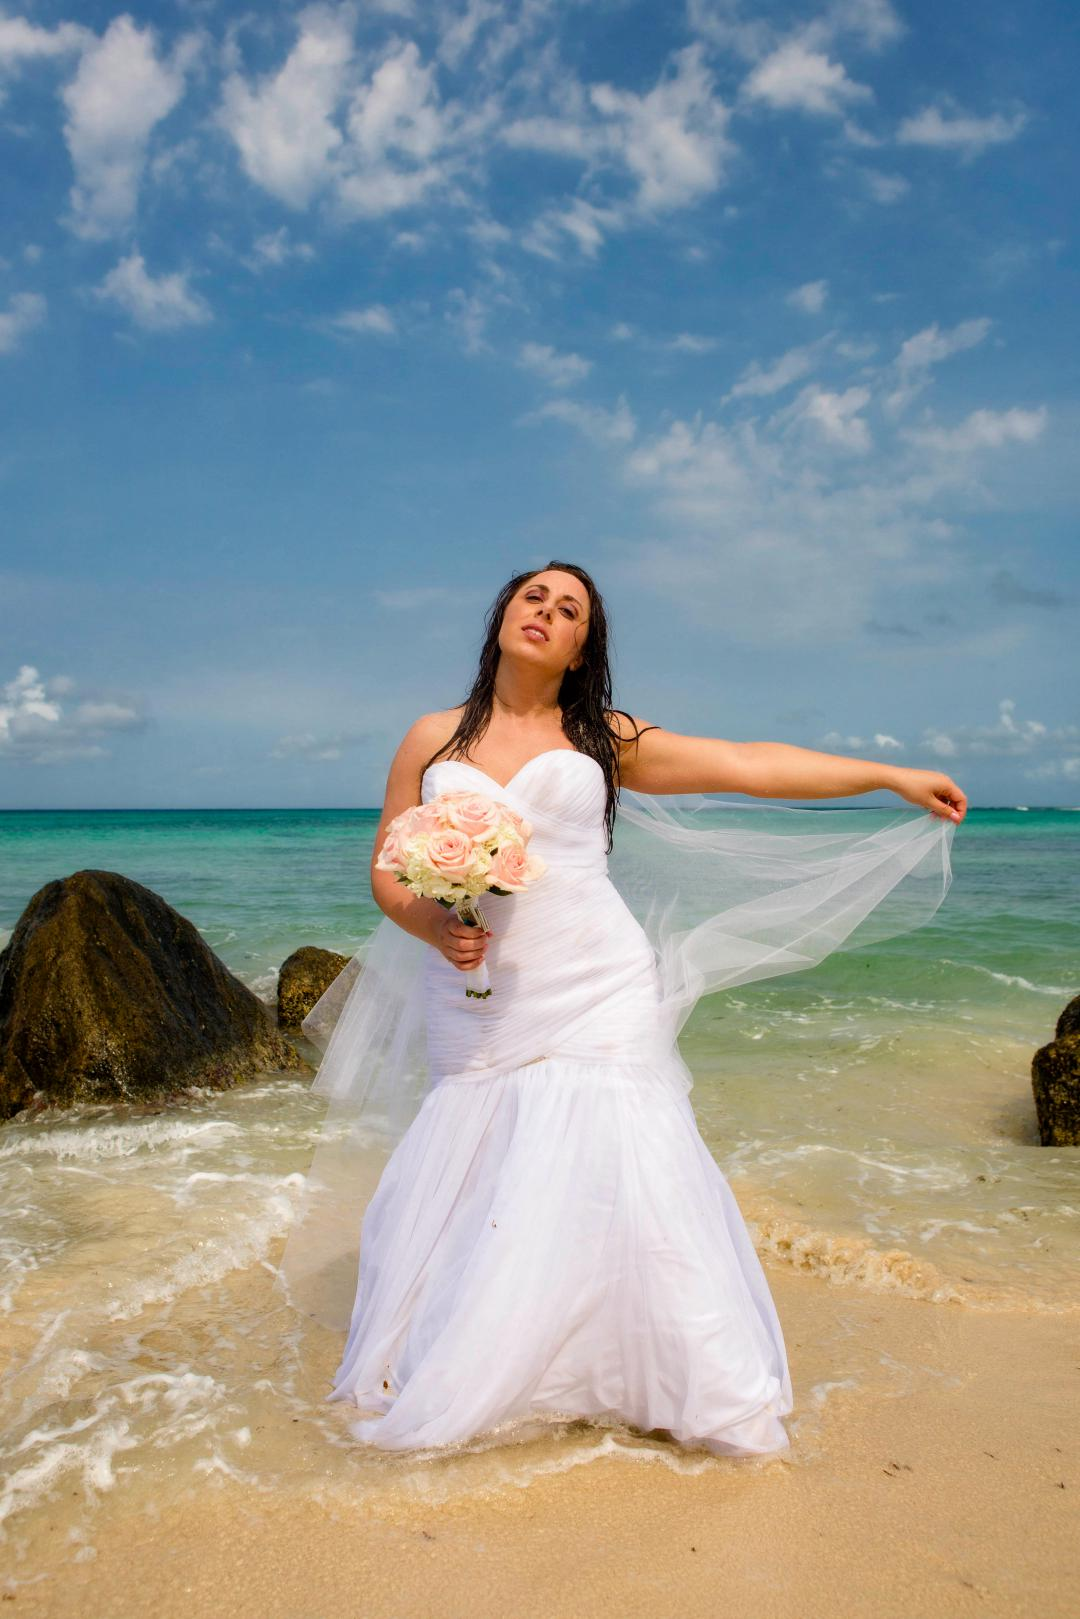 TRASH THE DRESS | Wedding Photography Aruba - Aruba Wedding Photographer